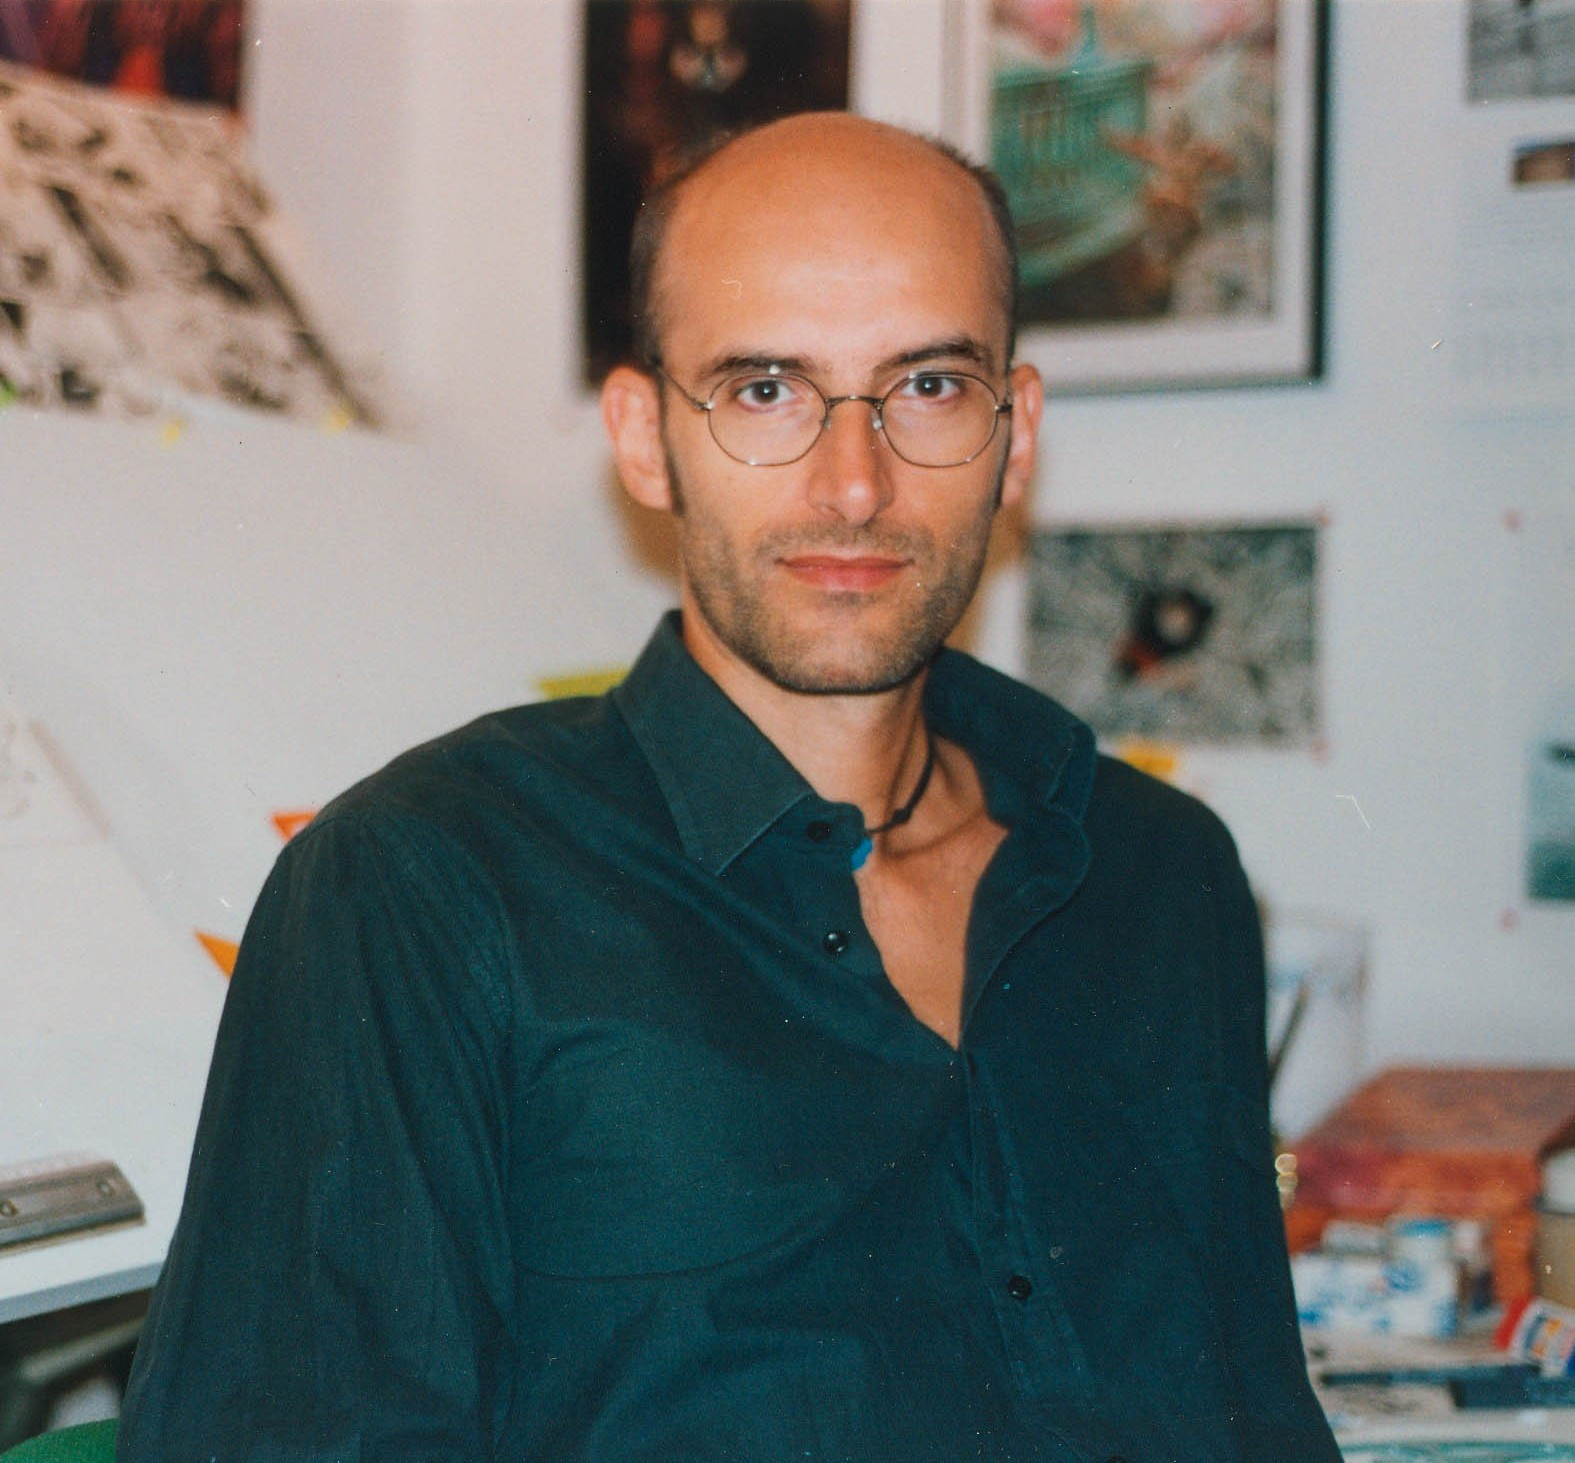 Max Bertolini